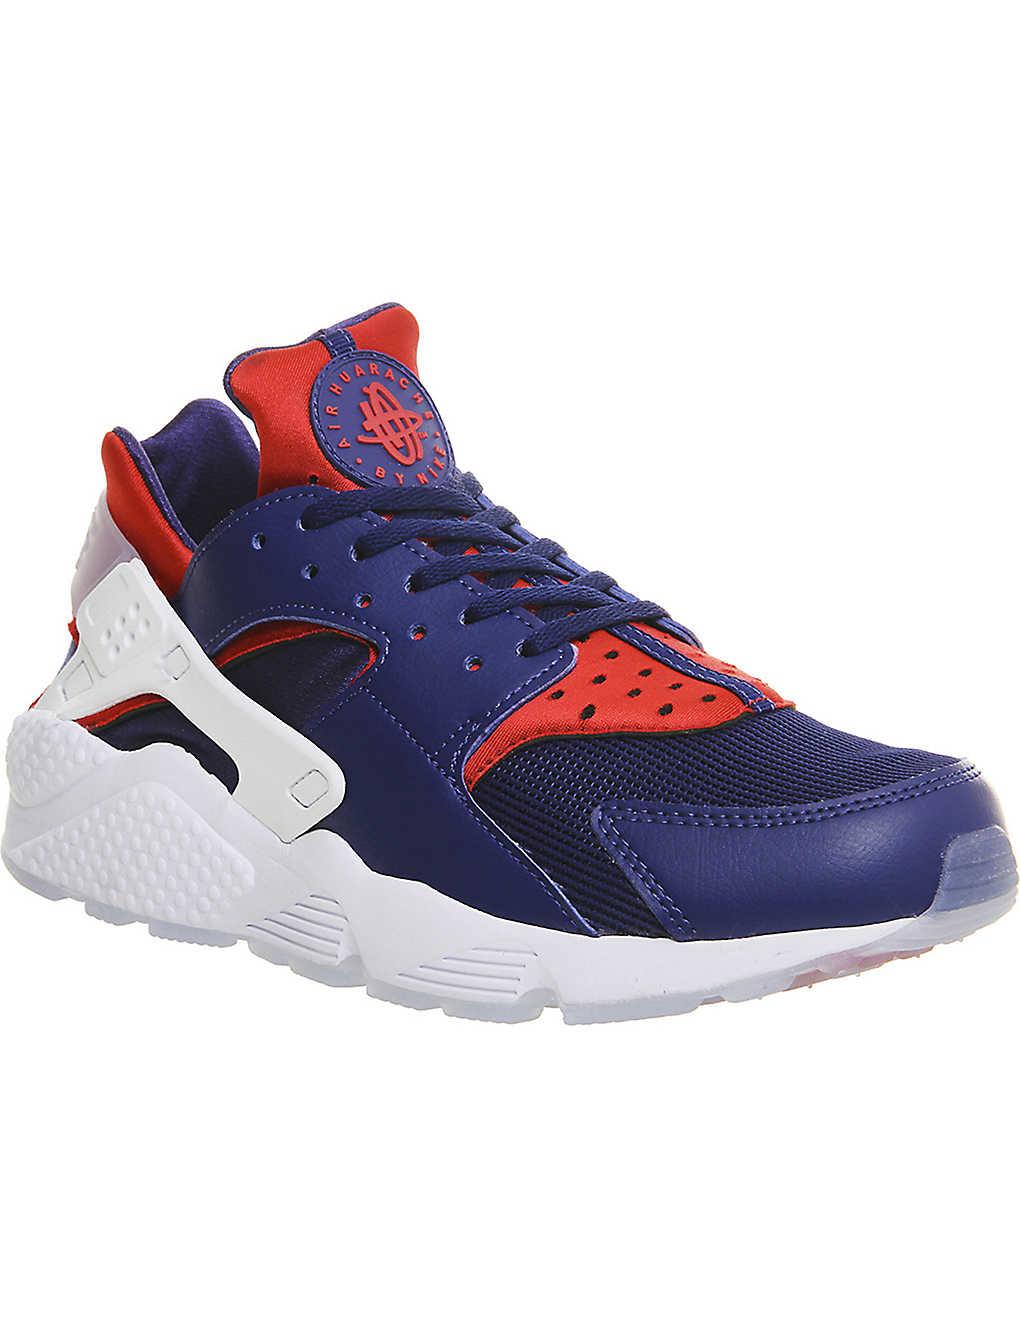 NIKE - Nike Air Huarache City Pack London trainers  ef8f1e1f5